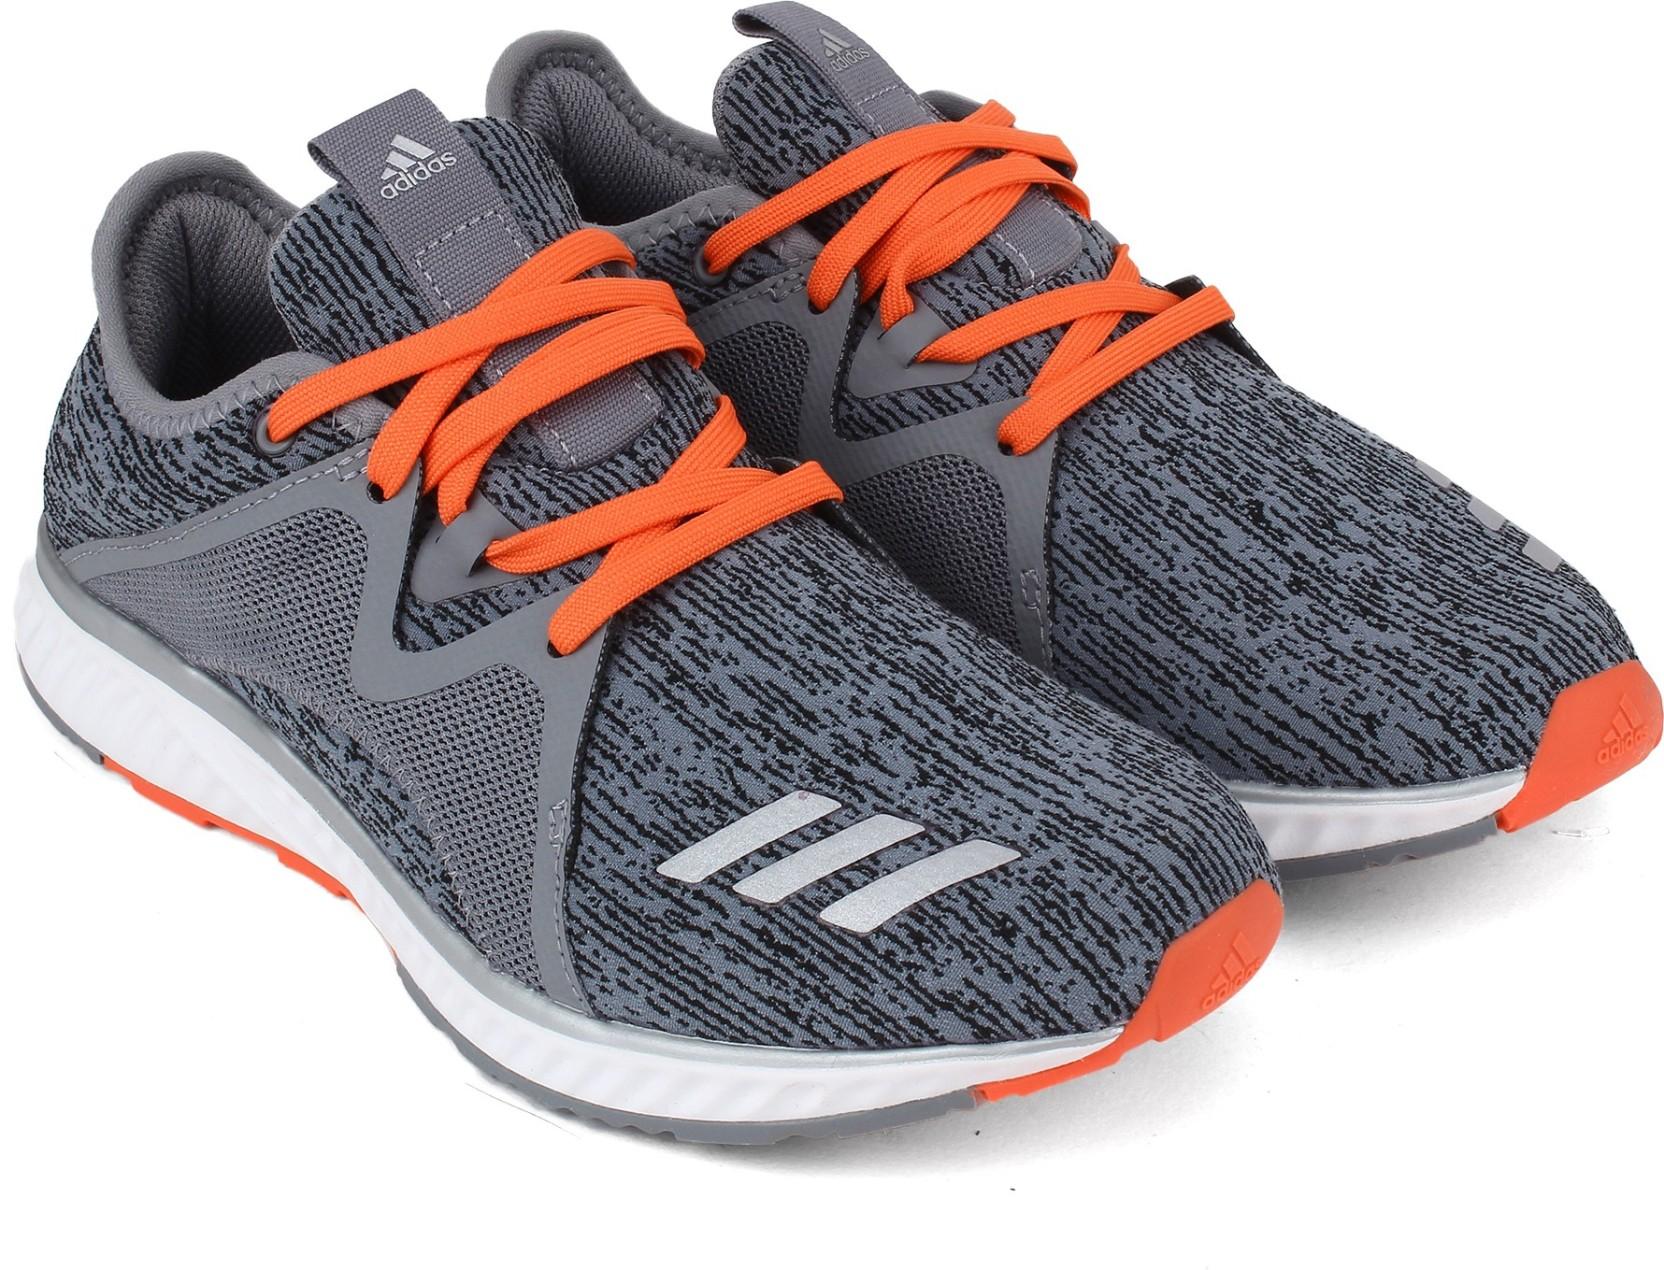 7d26c02ac ADIDAS EDGE LUX 2 Running Shoes For Women - Buy GRETHR SILVMT EASCOR ...